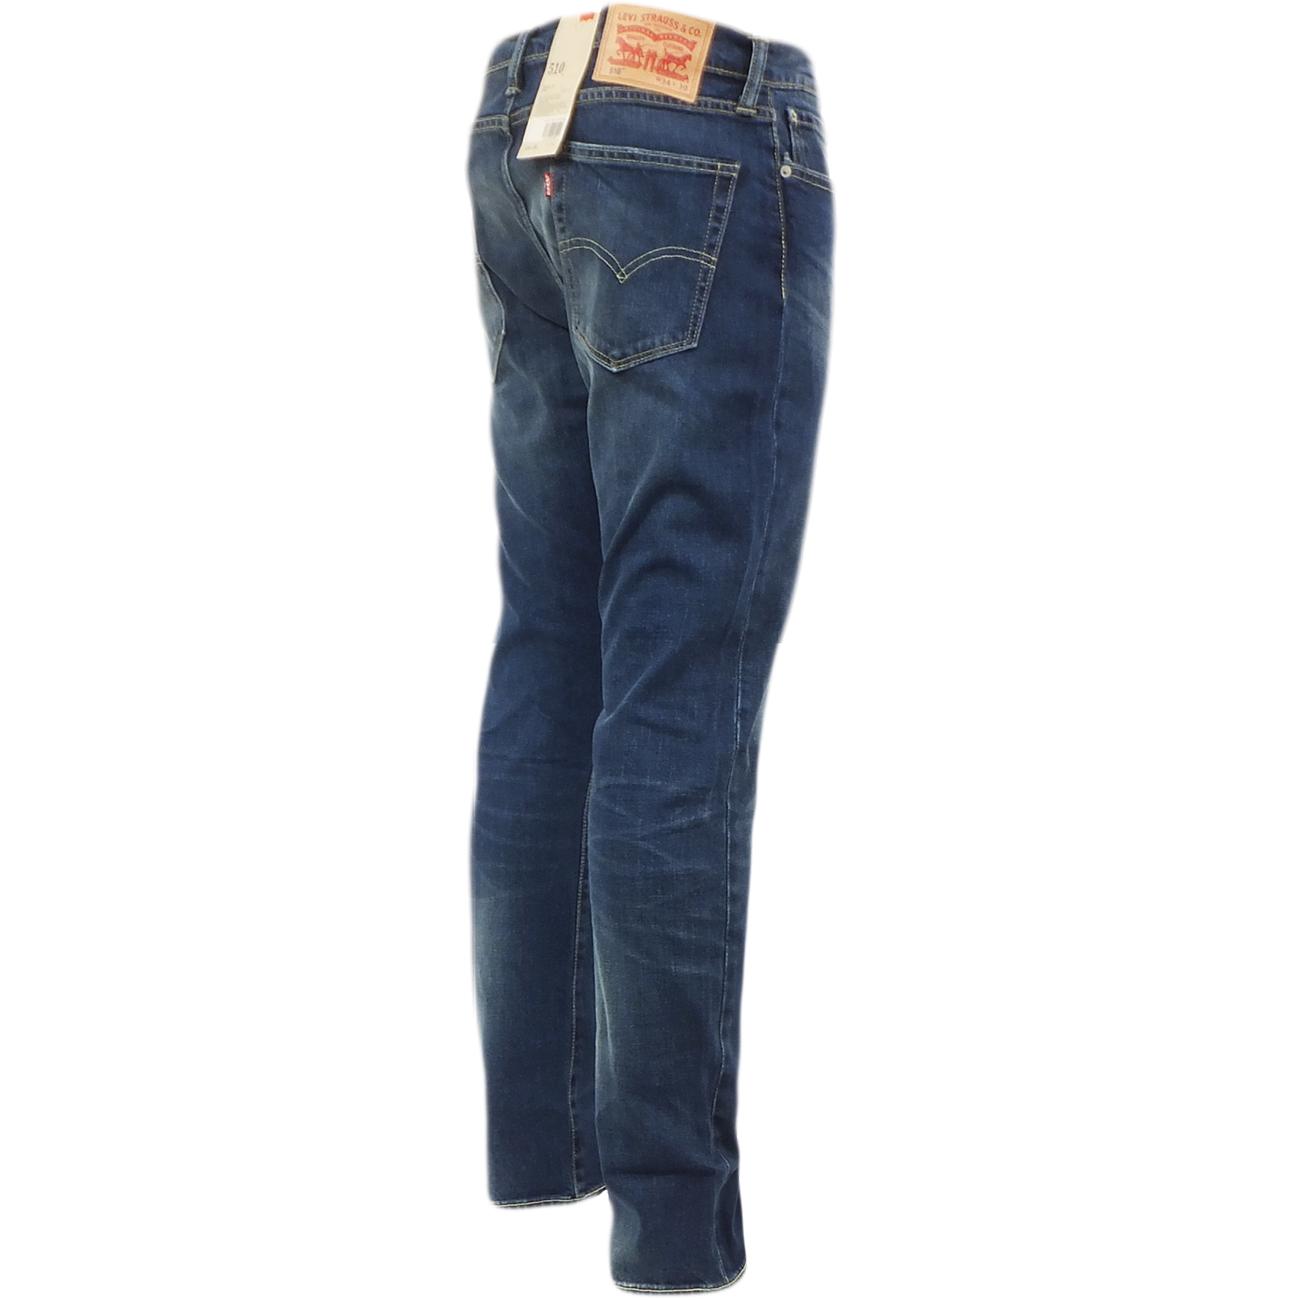 a0a96edbfbd0 Herren Levi 510 Skinny Fit Jeans Slim anliegendem Bein Canyon blau ...